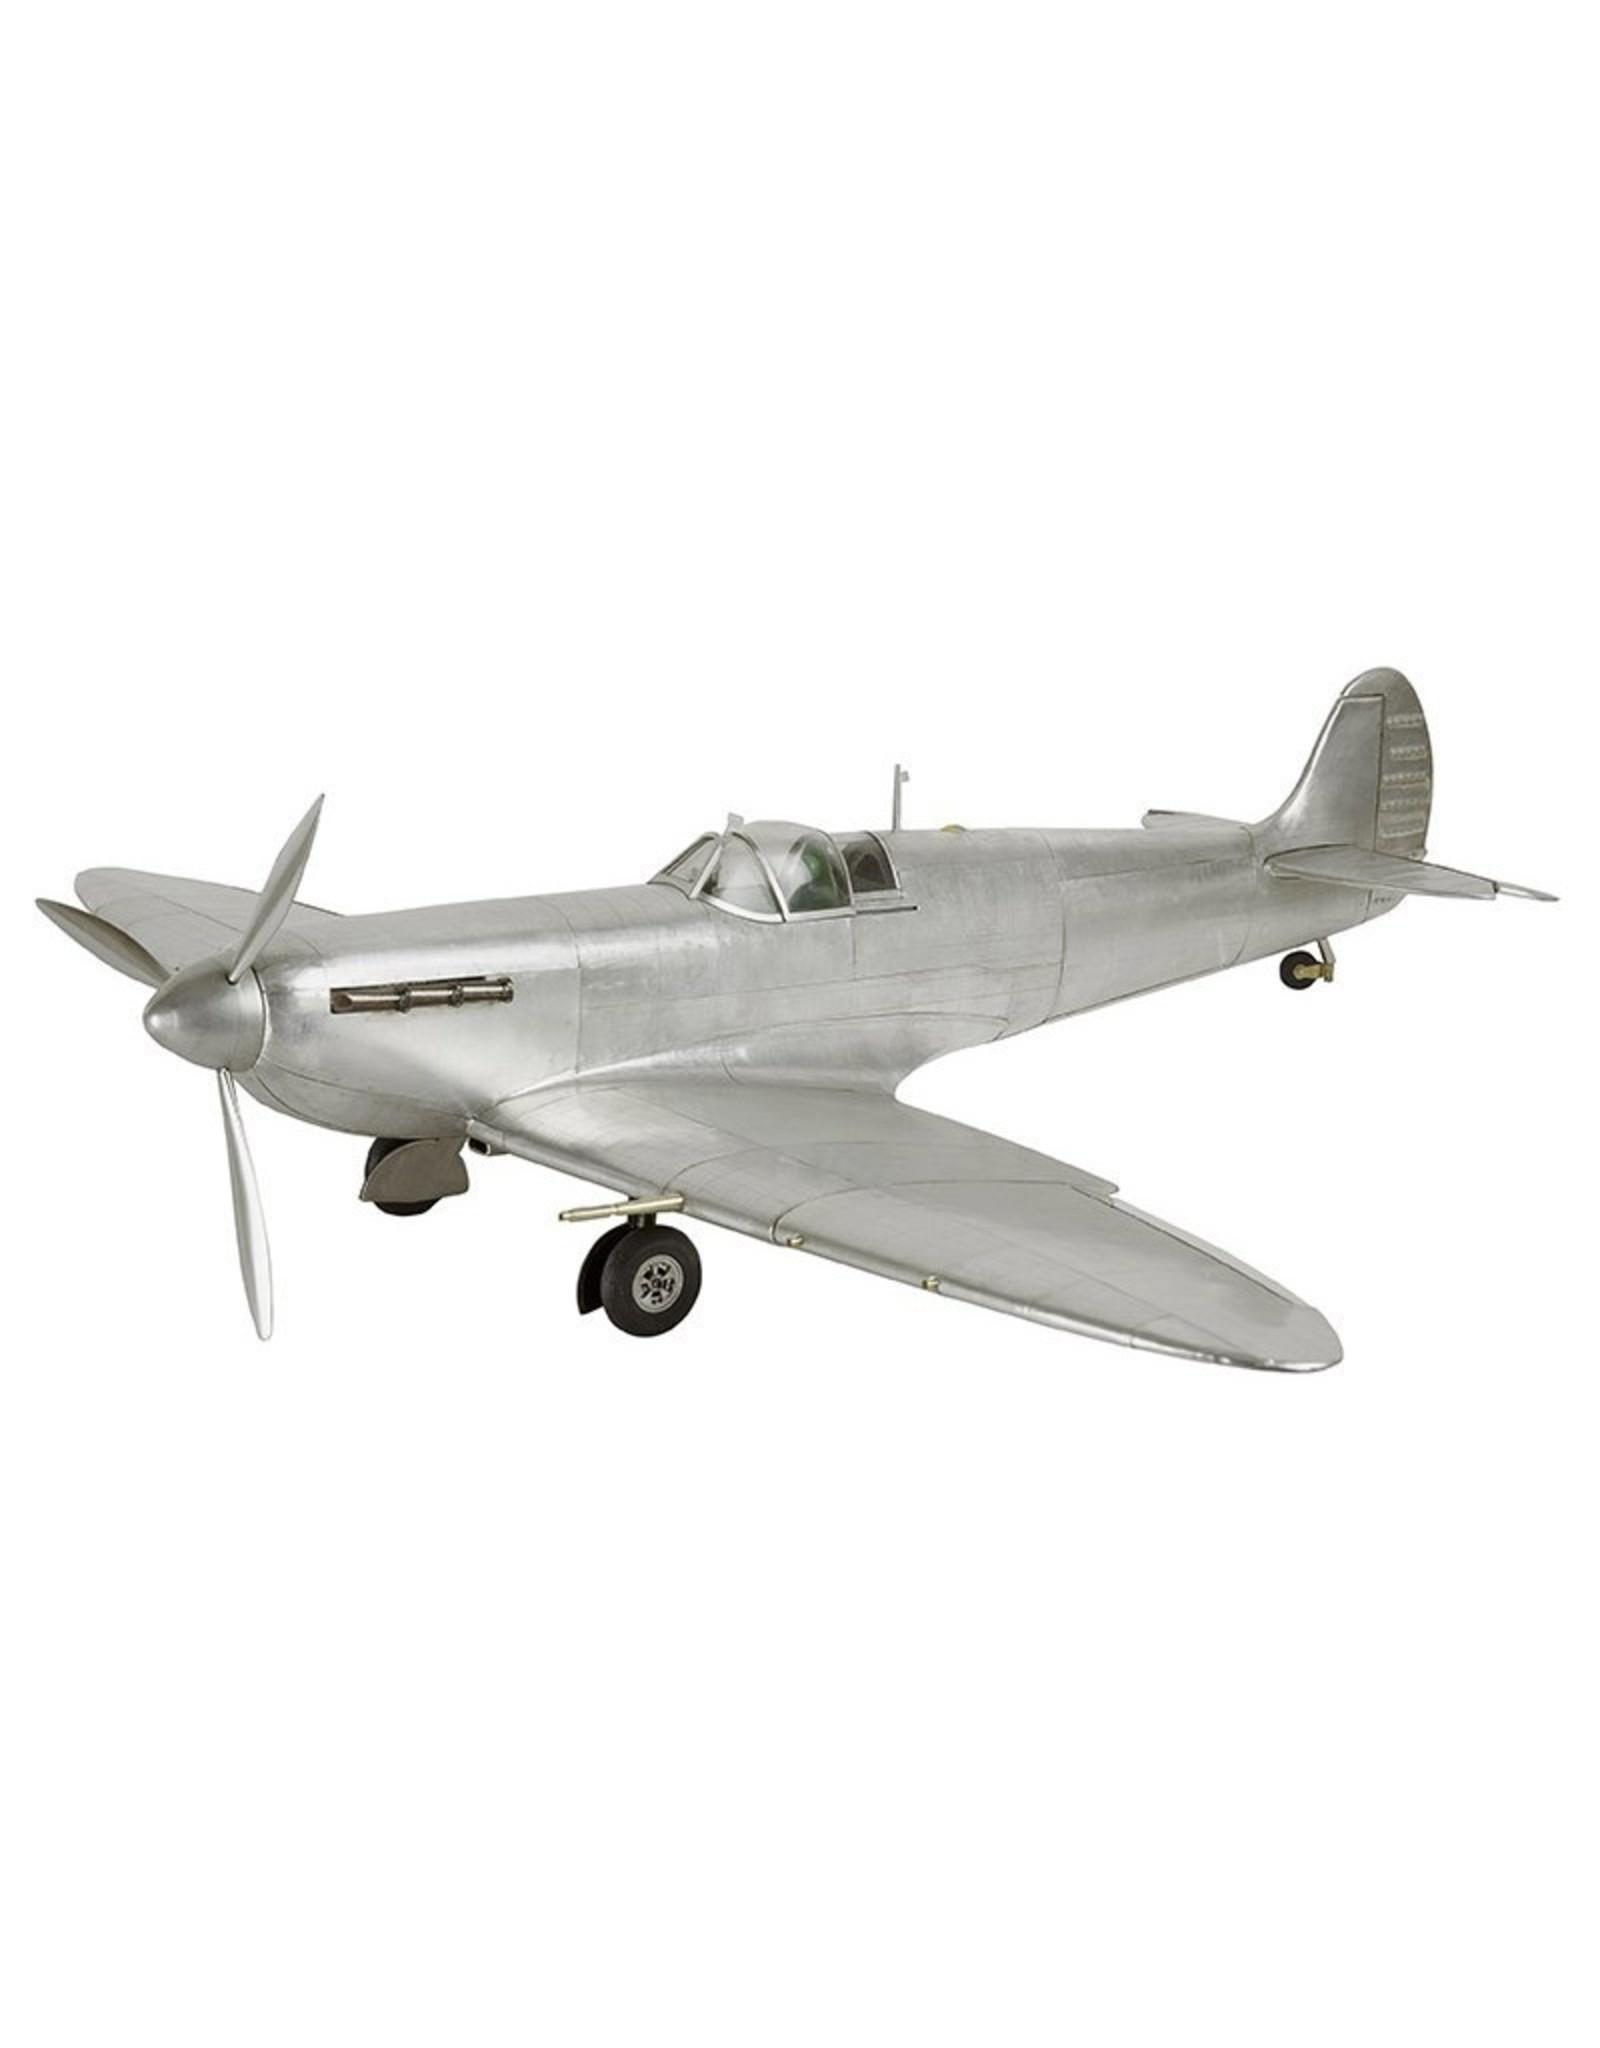 Plane Spitfire